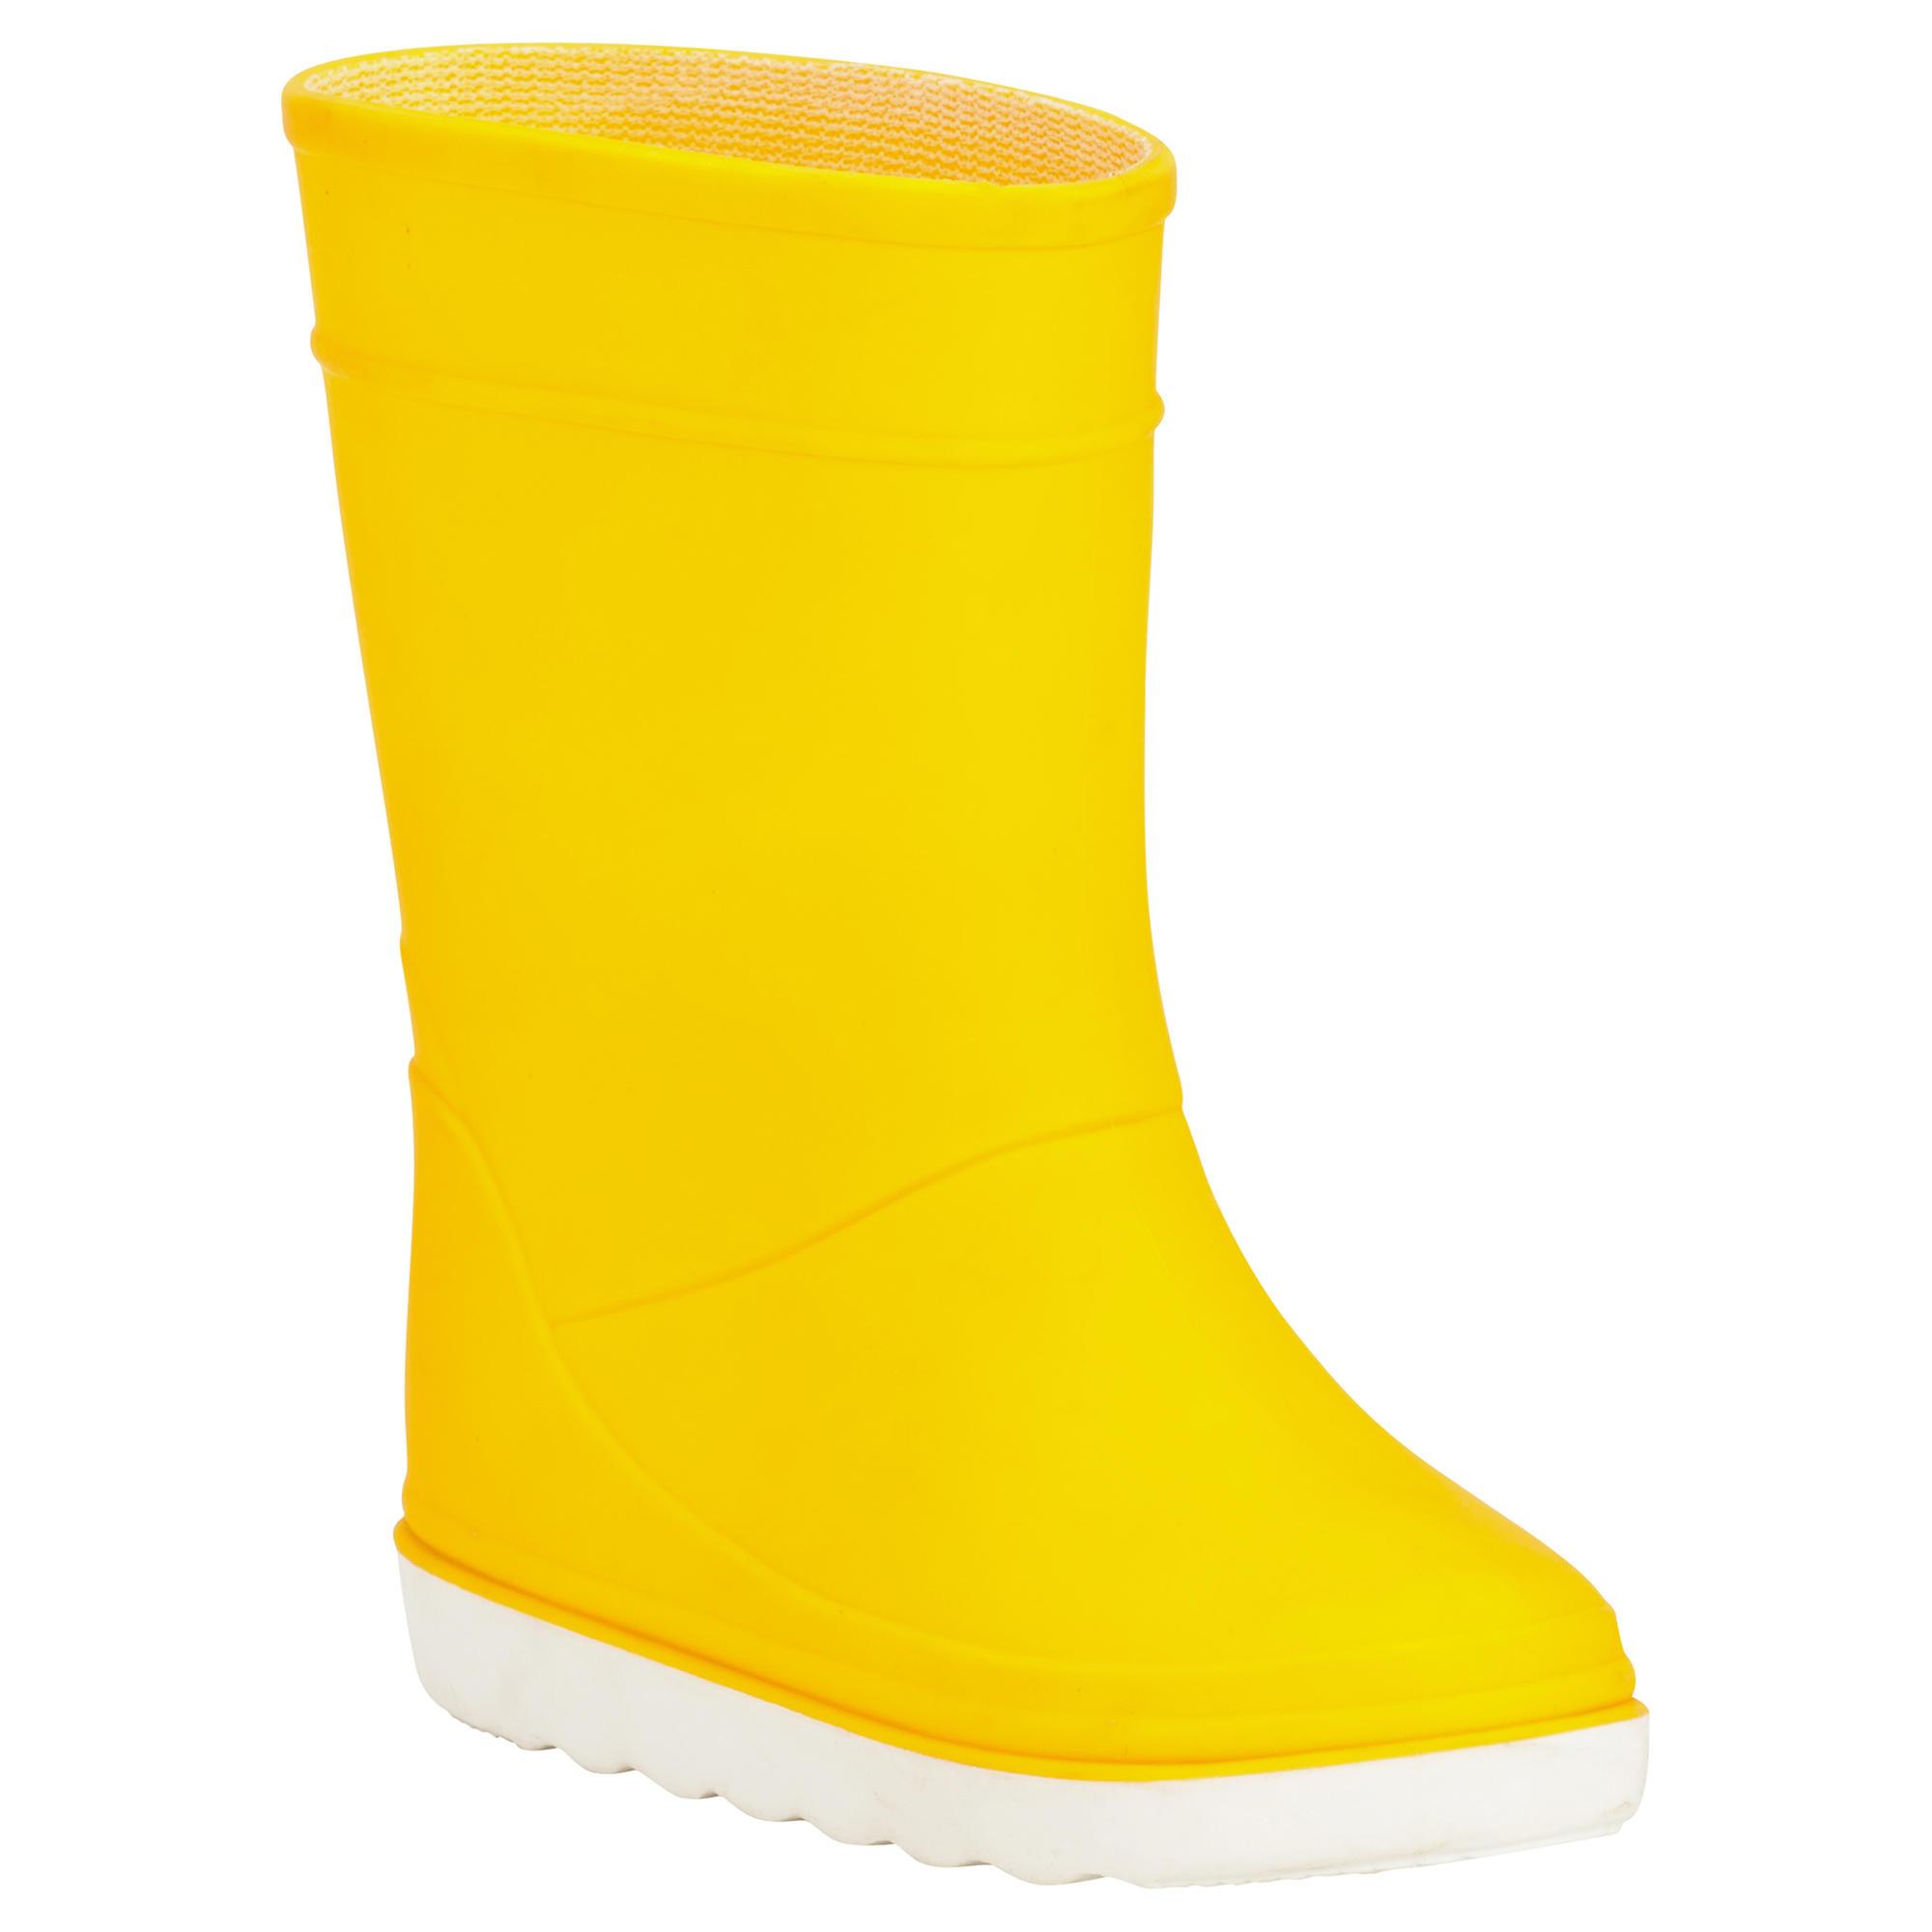 Bottes bateau b100 enfant jaune tribordvoile - Botte enfant decathlon ...